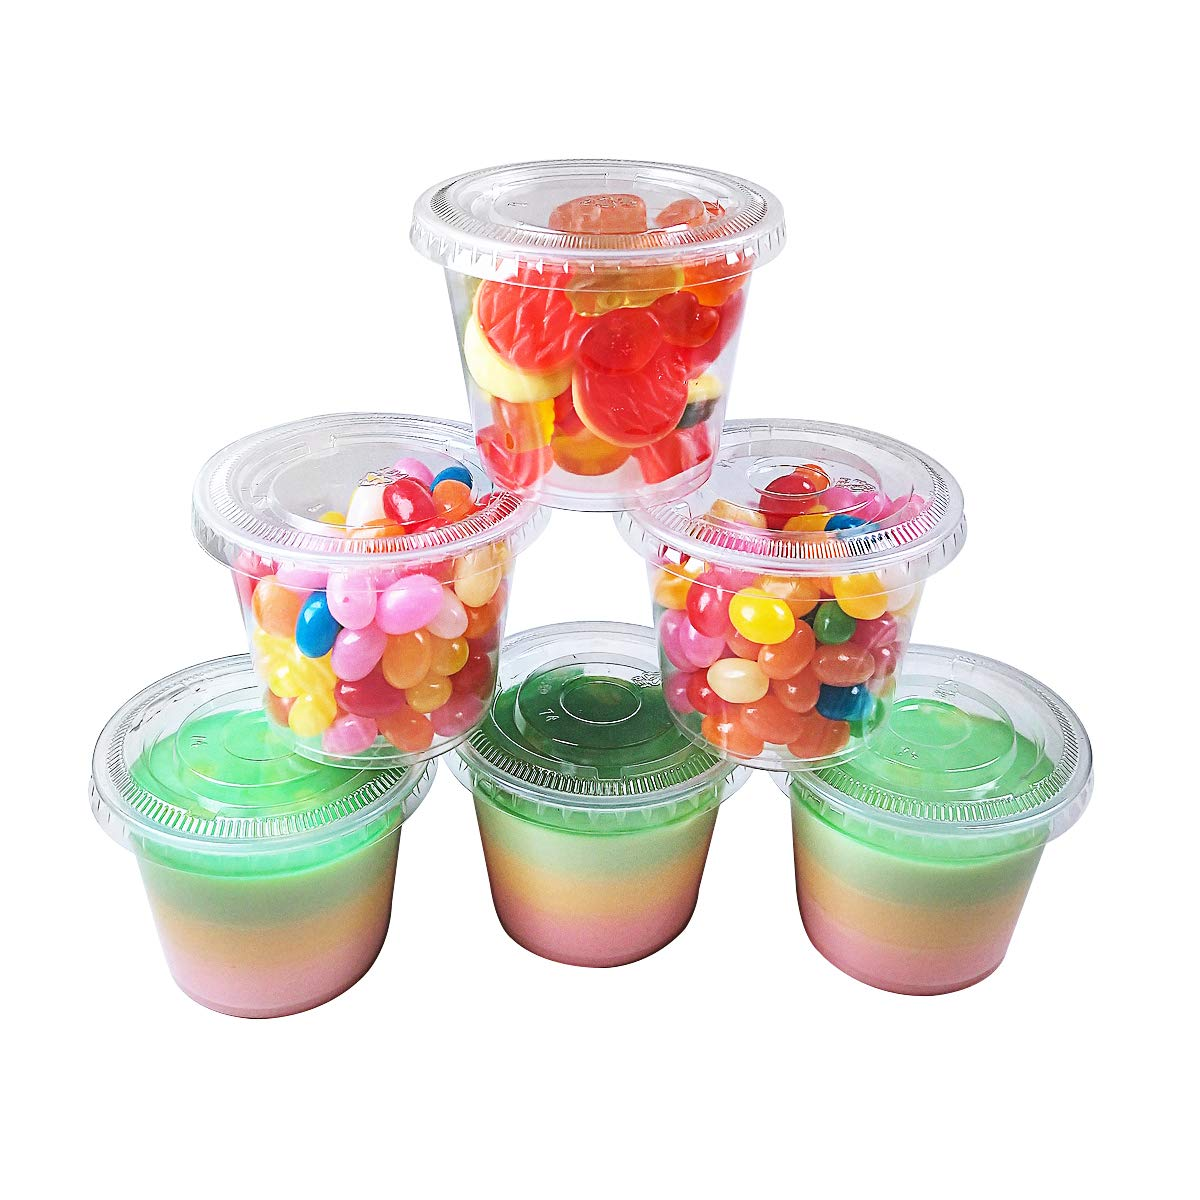 TashiBox 5.5 oz 200 Sets Disposable Plastic Jello Shot Cups with Lids, Souffle Portion Cups (5.5 oz 200 Sets) by TashiBox